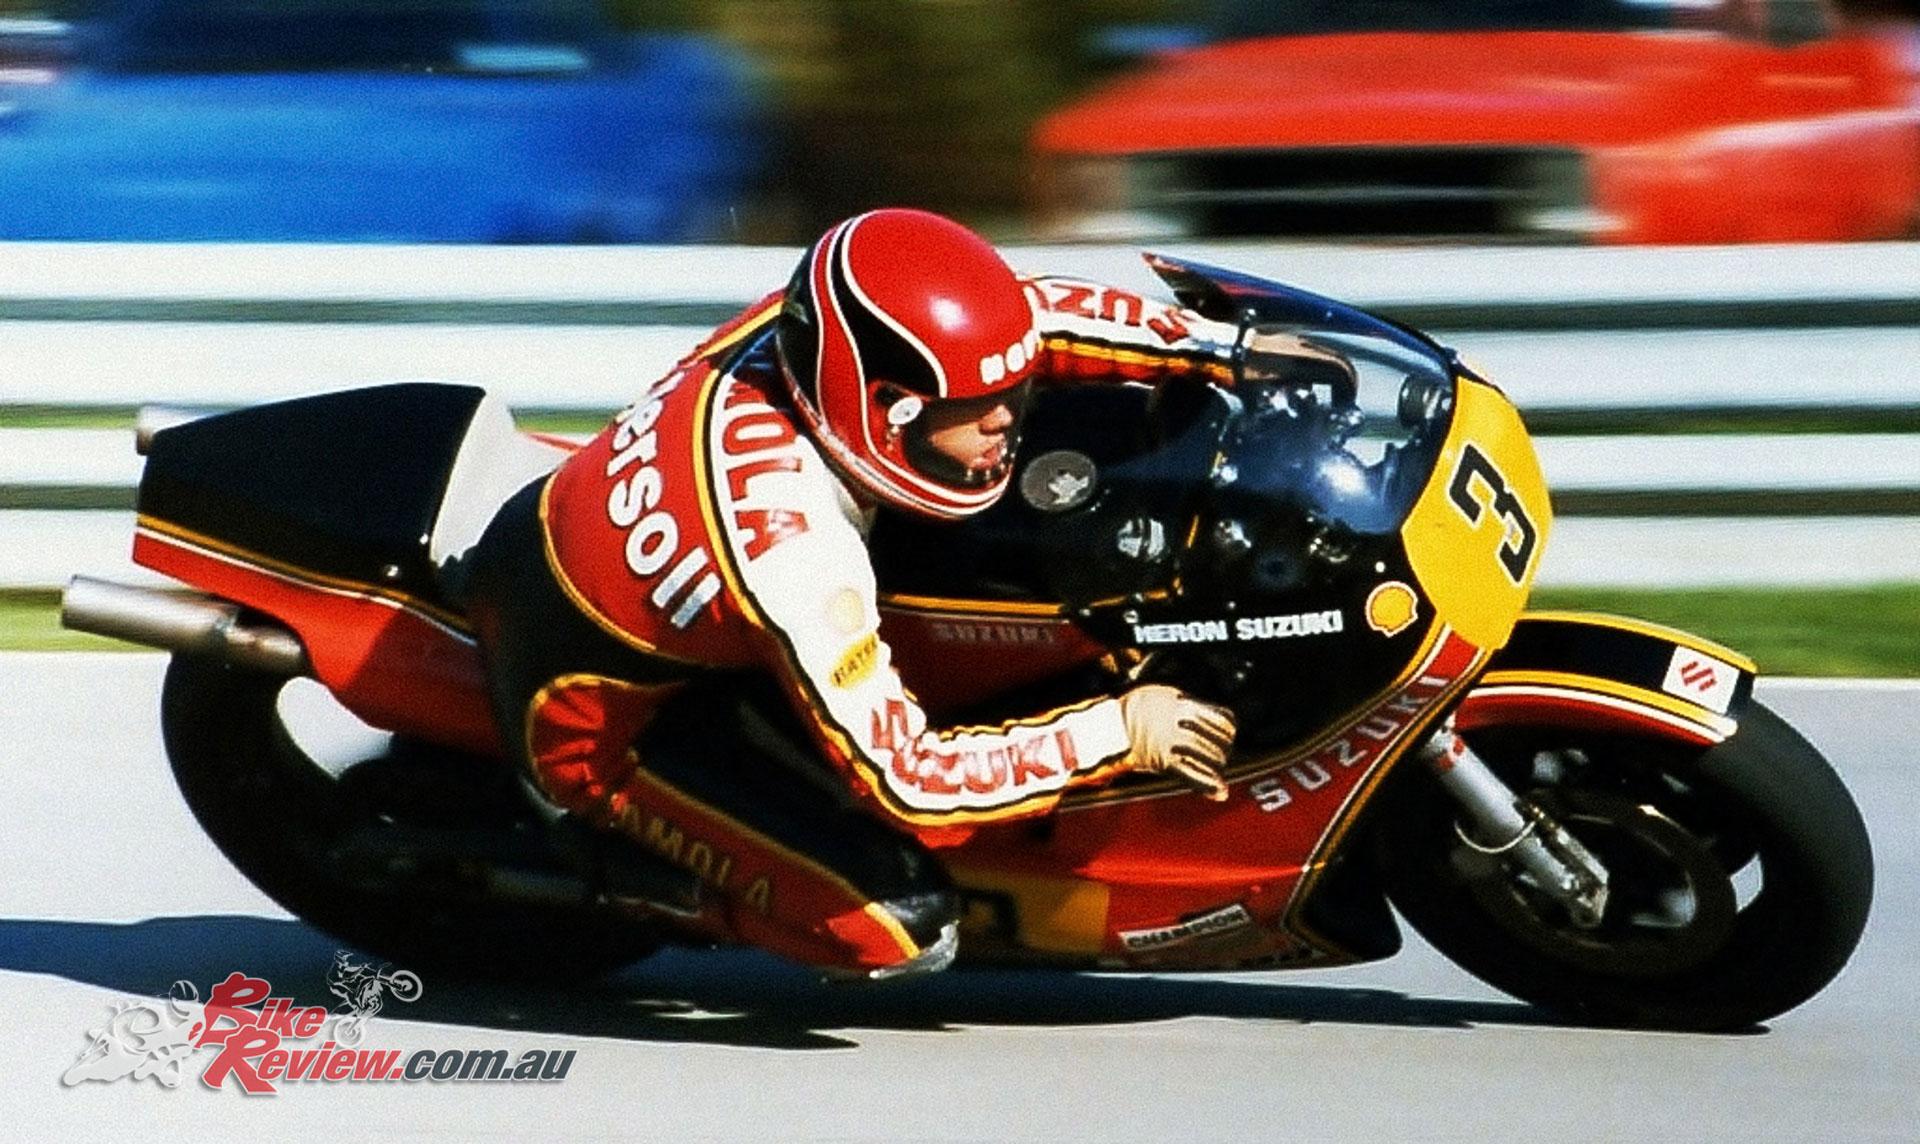 Randy Mamola to become a MotoGP Legend - Bike Review